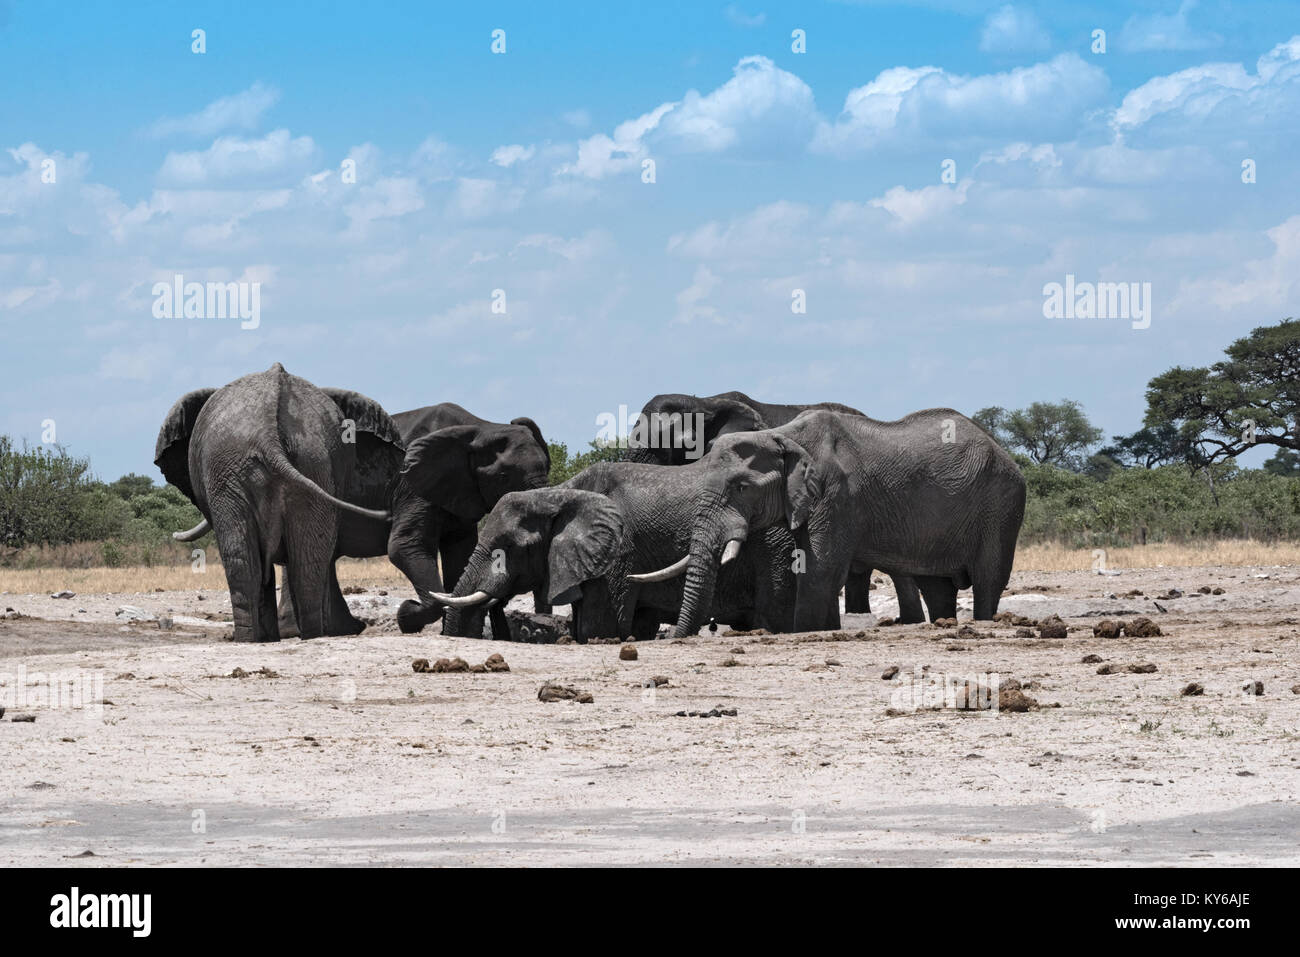 Gruppo di elefanti a waterhole Chope nel Parco Nazionale del Botswana Foto Stock